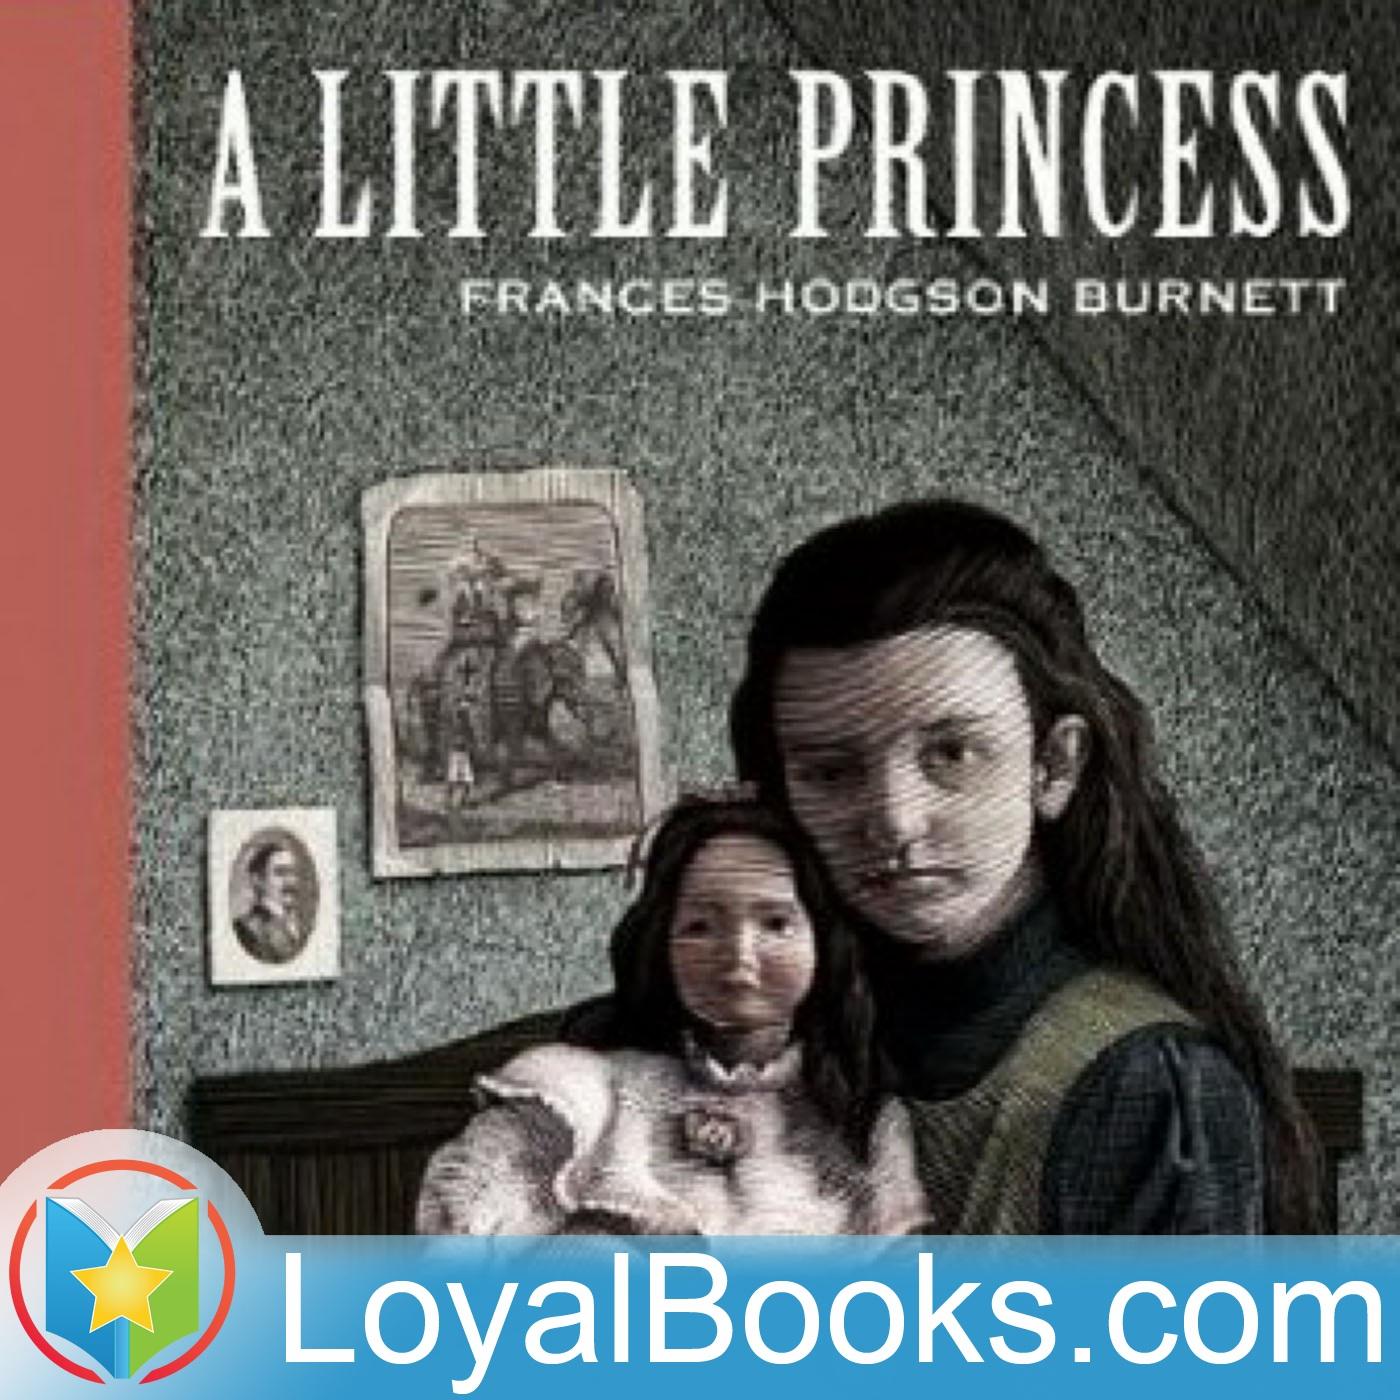 <![CDATA[A Little Princess by Frances Hodgson Burnett]]>